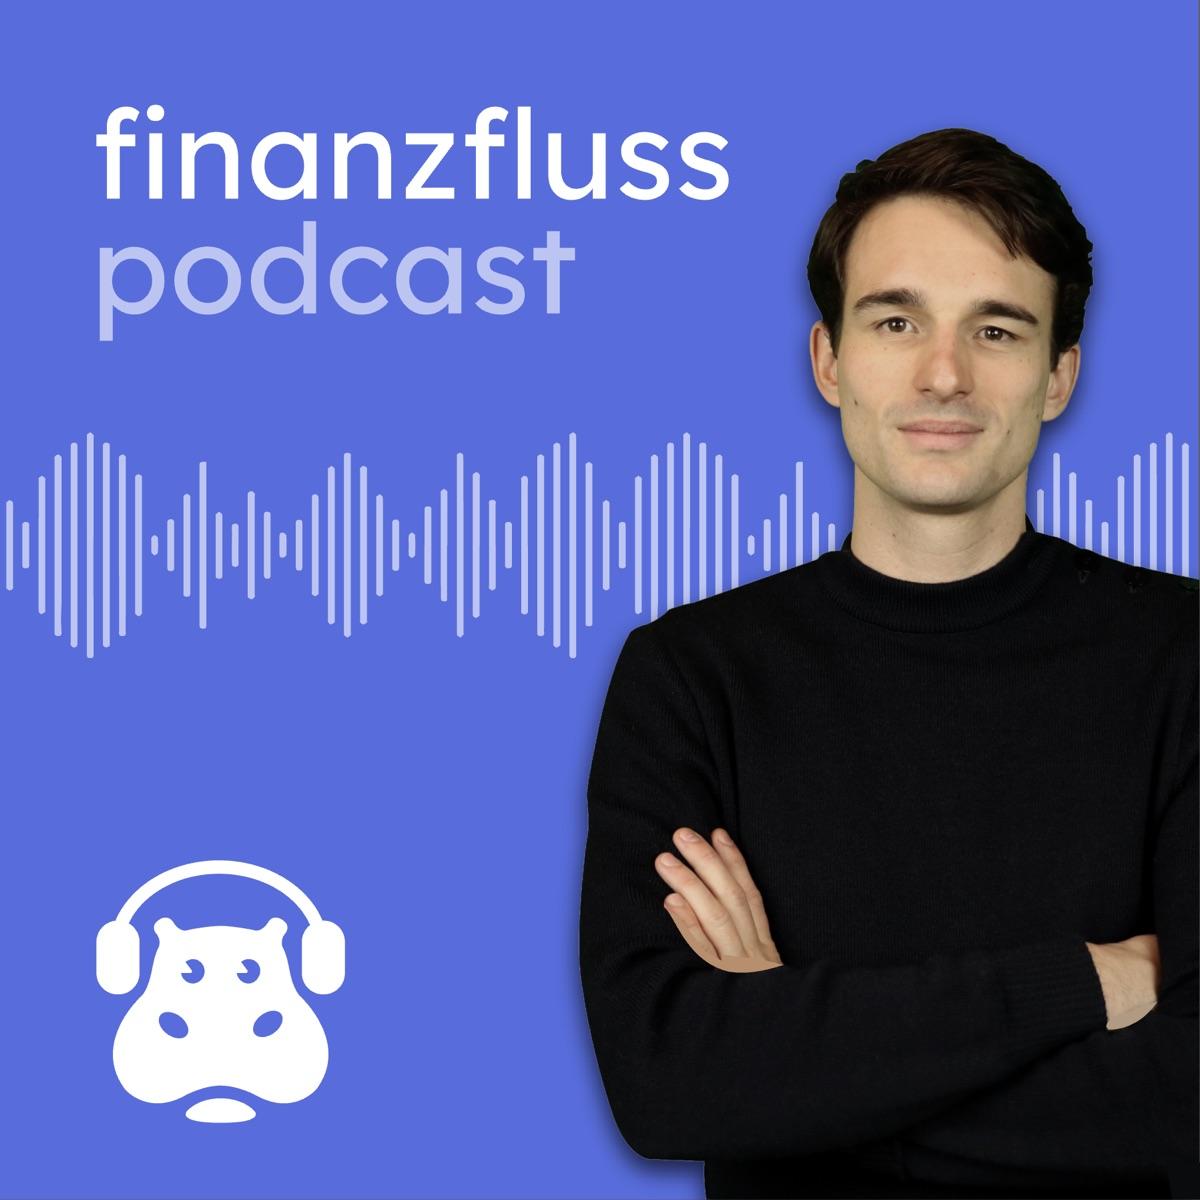 Finanzfluss Podcast